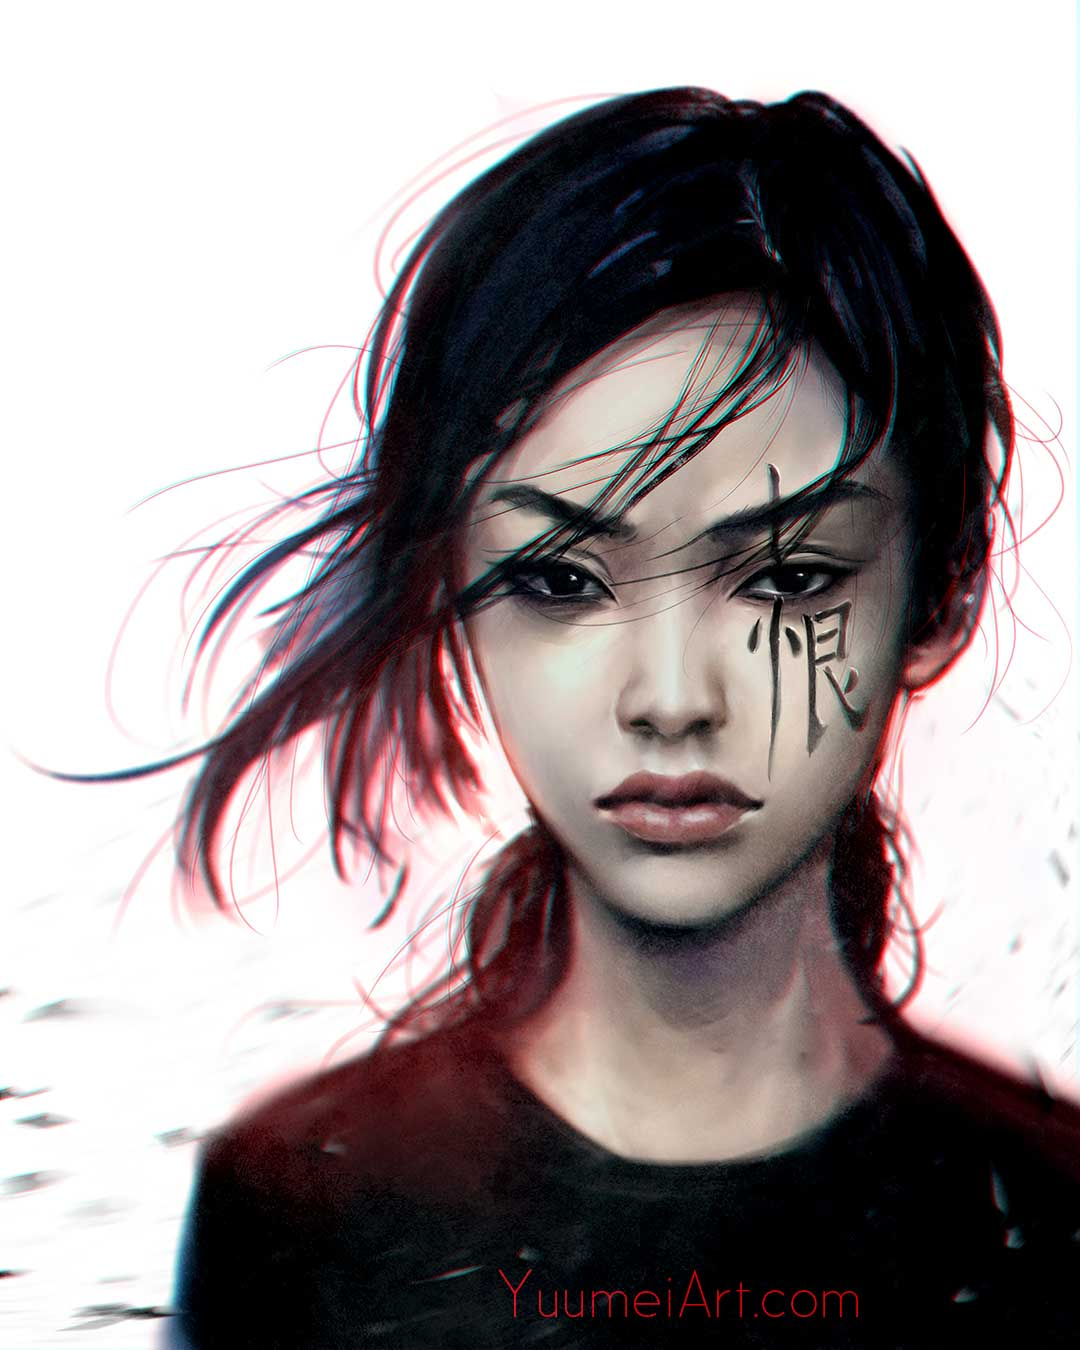 Contempt by Artist Wenqing Yan, aka Yuumei